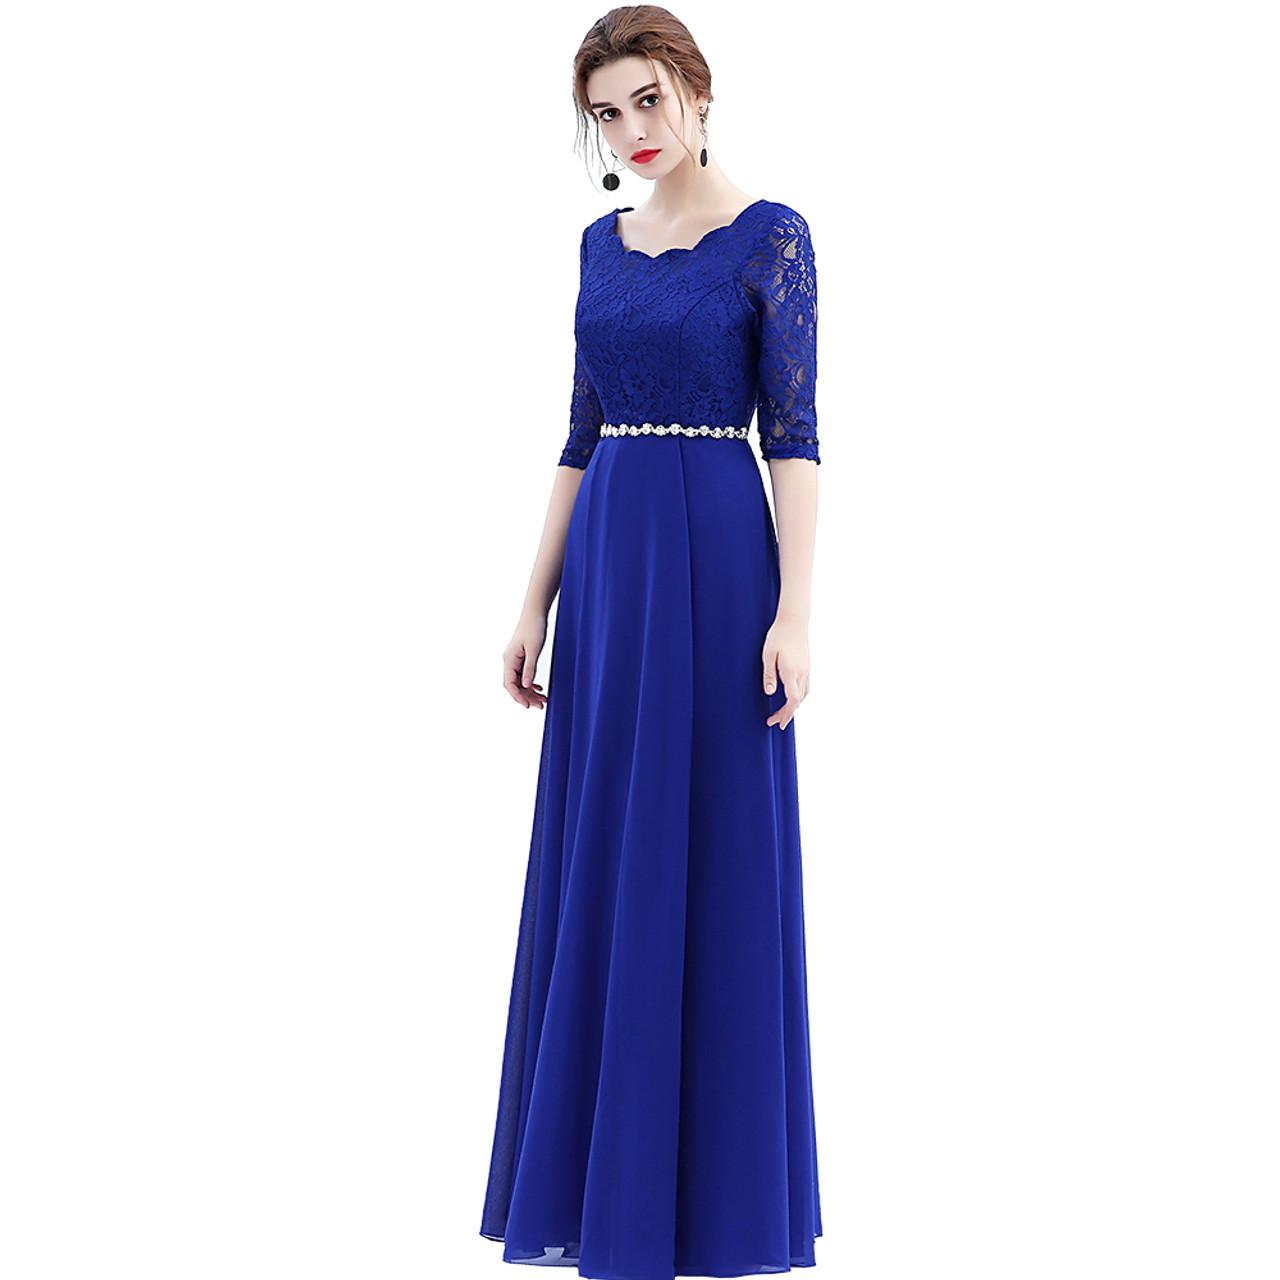 06fca68853d5 ... 2018 Custom Made Elegant Black Winter Evening Dresses Lace Half Sleeve  Robe De Soiree Long Vestido ...